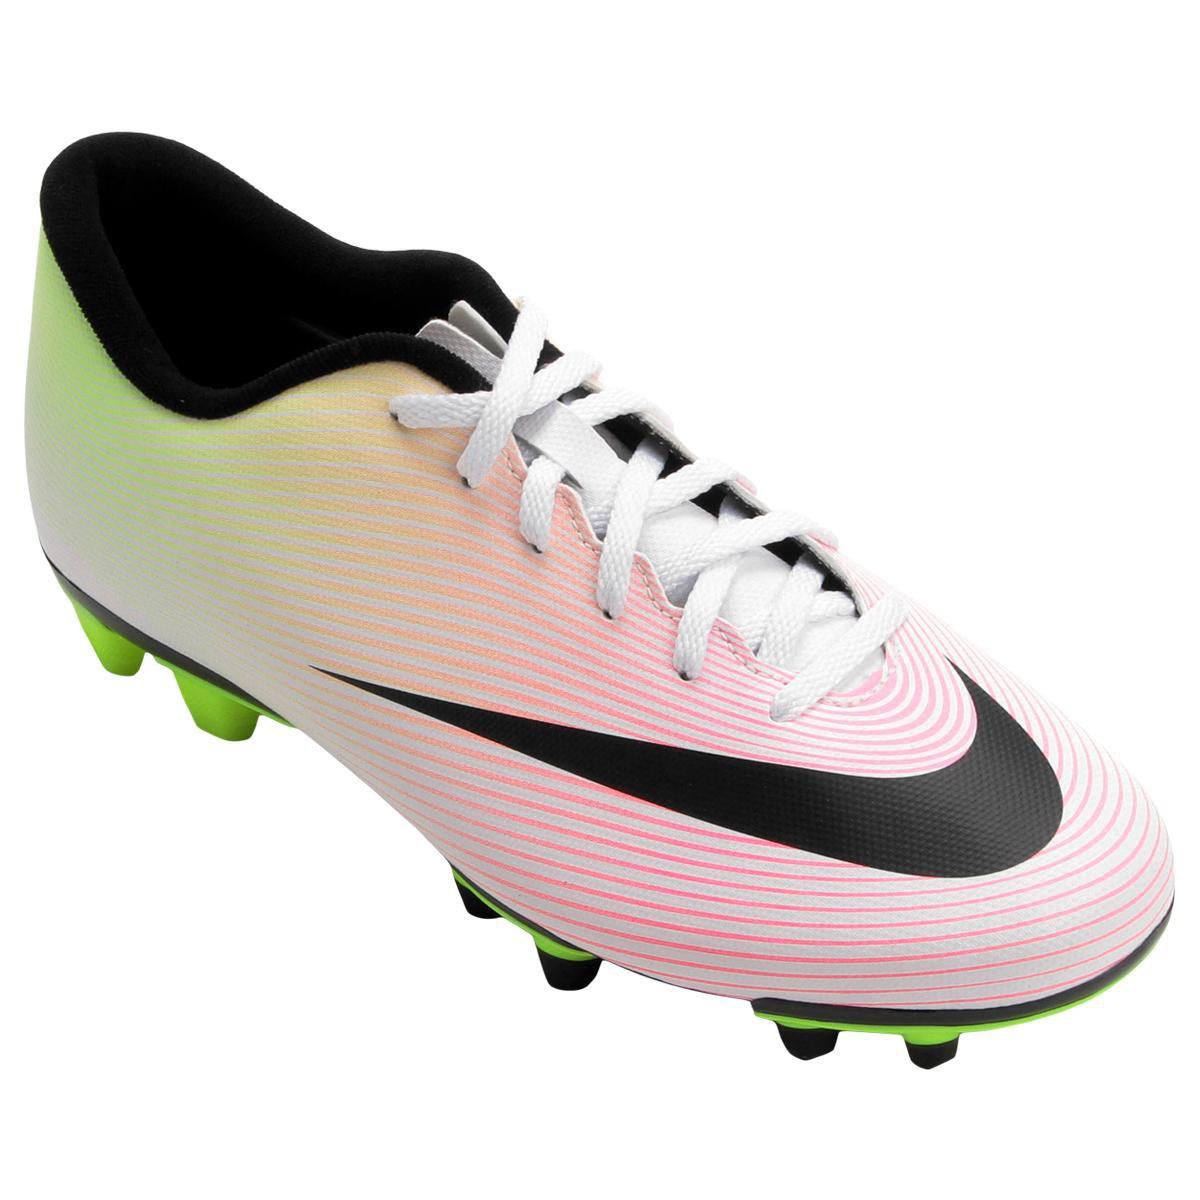 8bb57d9aaf0a9 Chuteira Campo Nike Mercurial Vortex 2 FG Masculina - Compre Agora ...